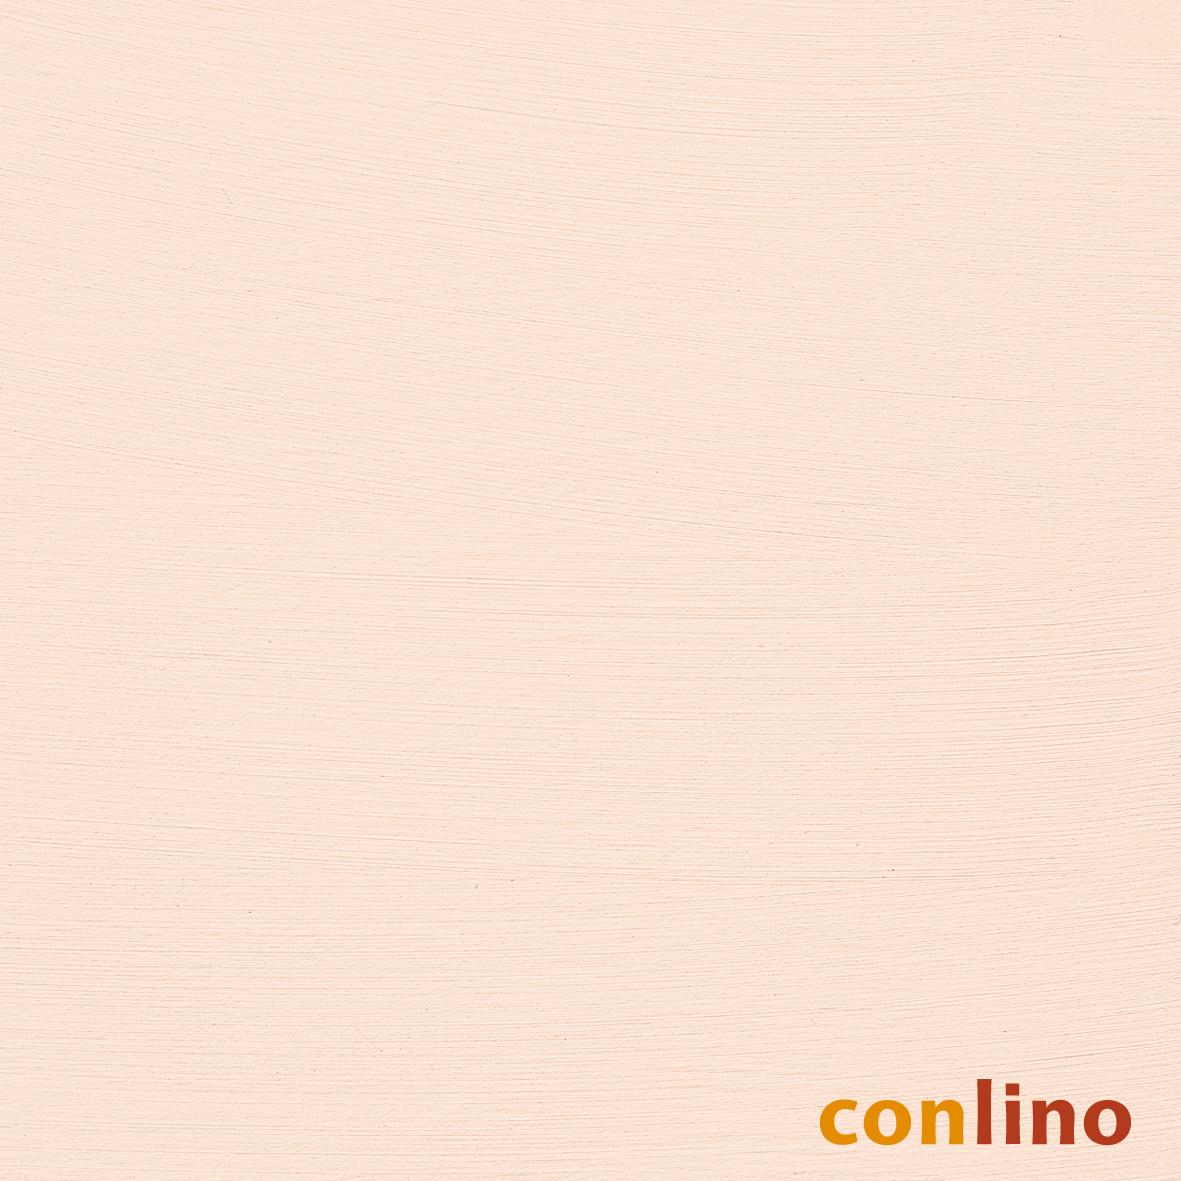 conlino Lehmfarbe Puder CL 103